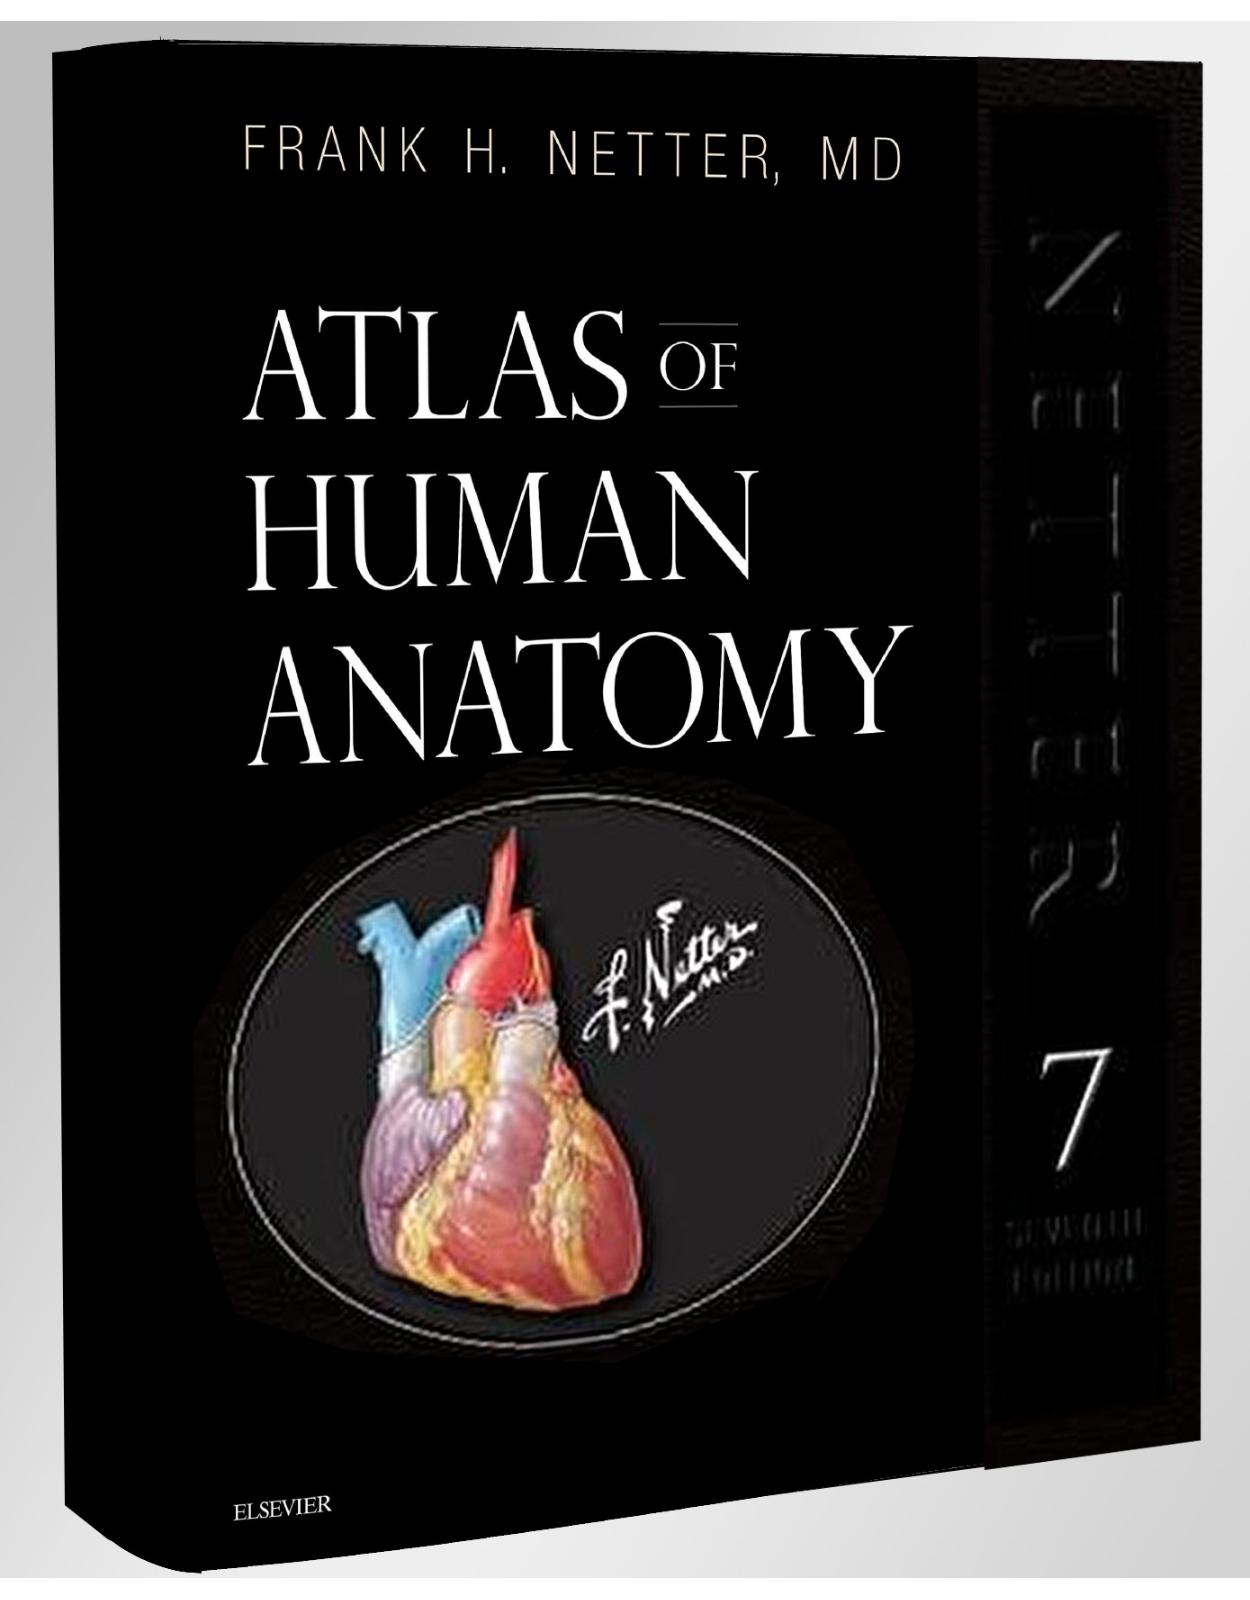 Atlas of Human Anatomy, Professional Edition, 7th Edition